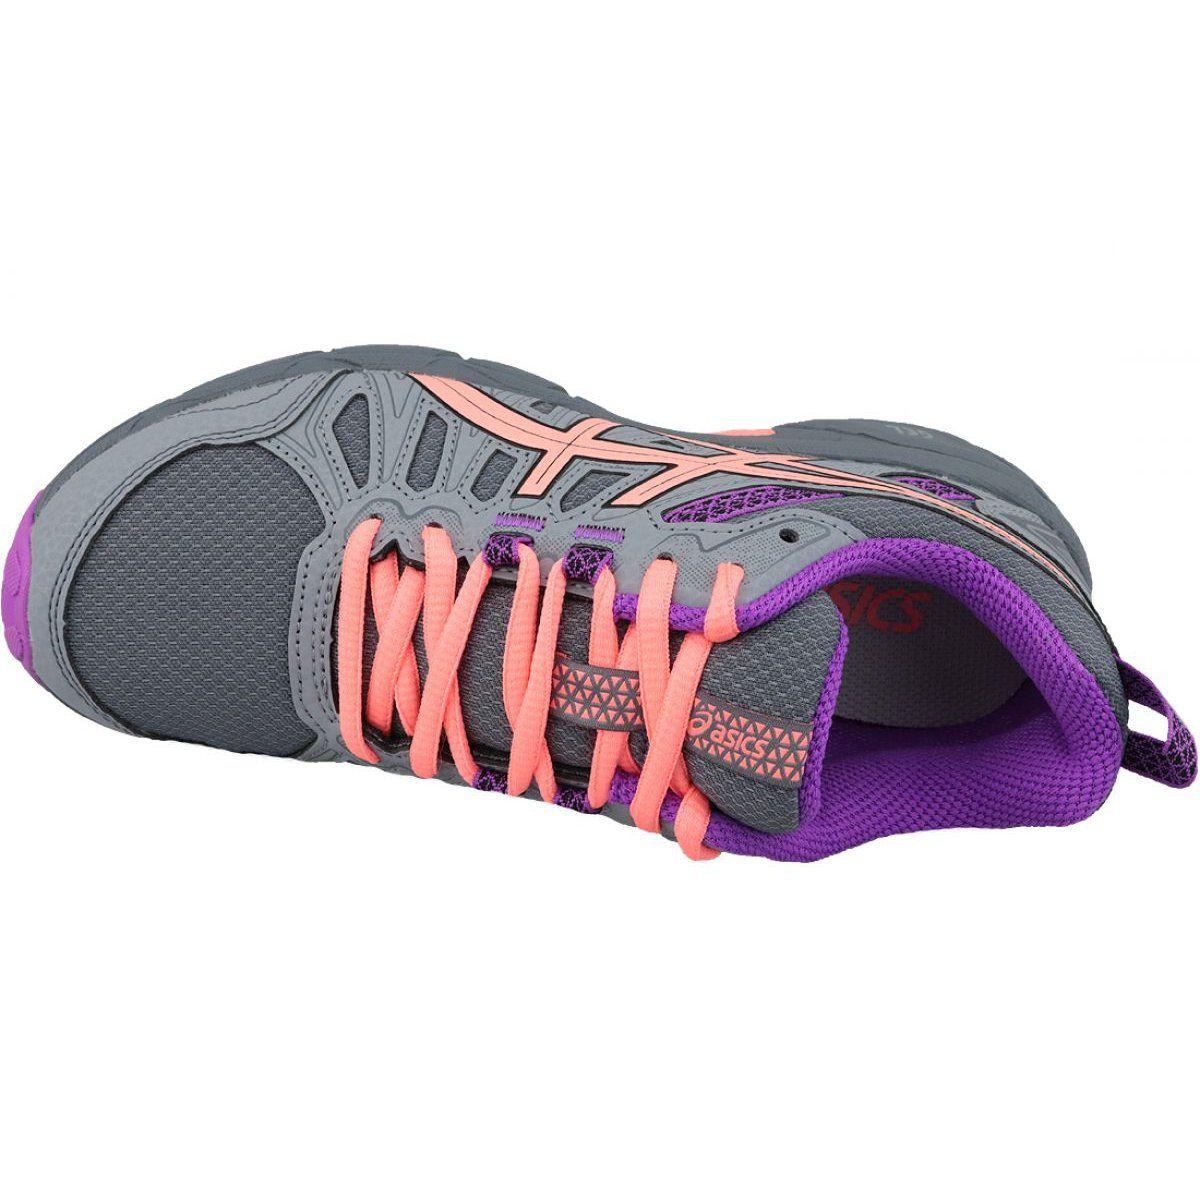 Buty Biegowe Asics Gel Venture 7 Gs Jr 1014a072 020 Szare Running Shoes Grey Asics Gel Venture Asics Gel